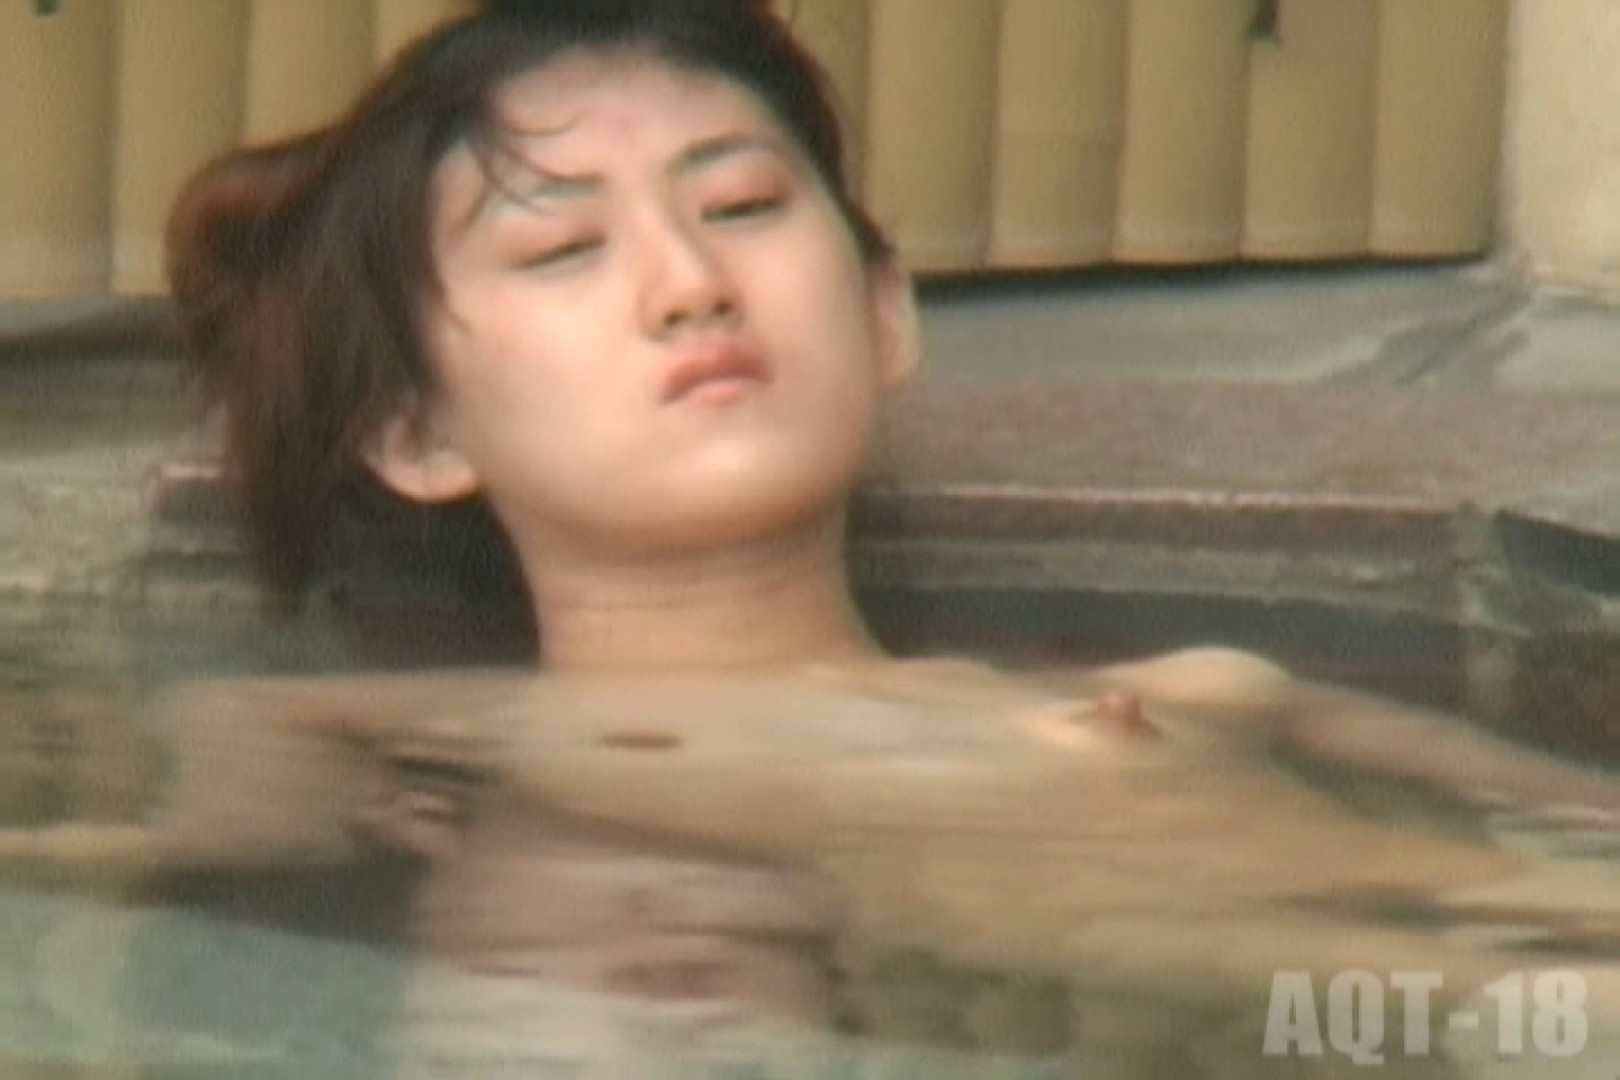 Aquaな露天風呂Vol.862 盗撮 AV無料動画キャプチャ 92PICs 53